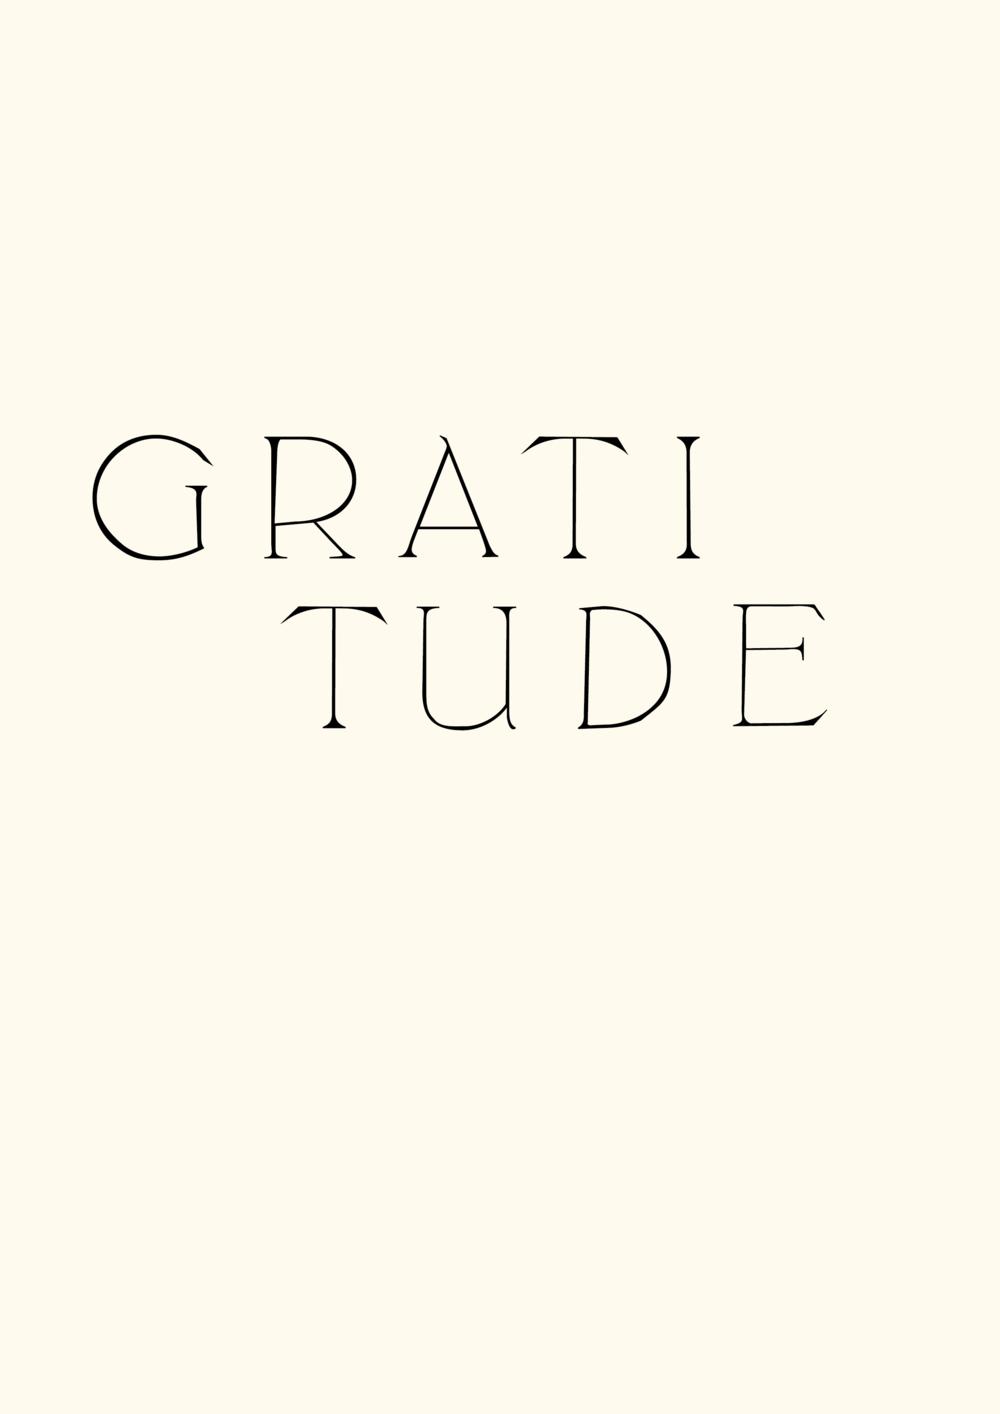 gratitude typography branding // phylleli design studio and blog